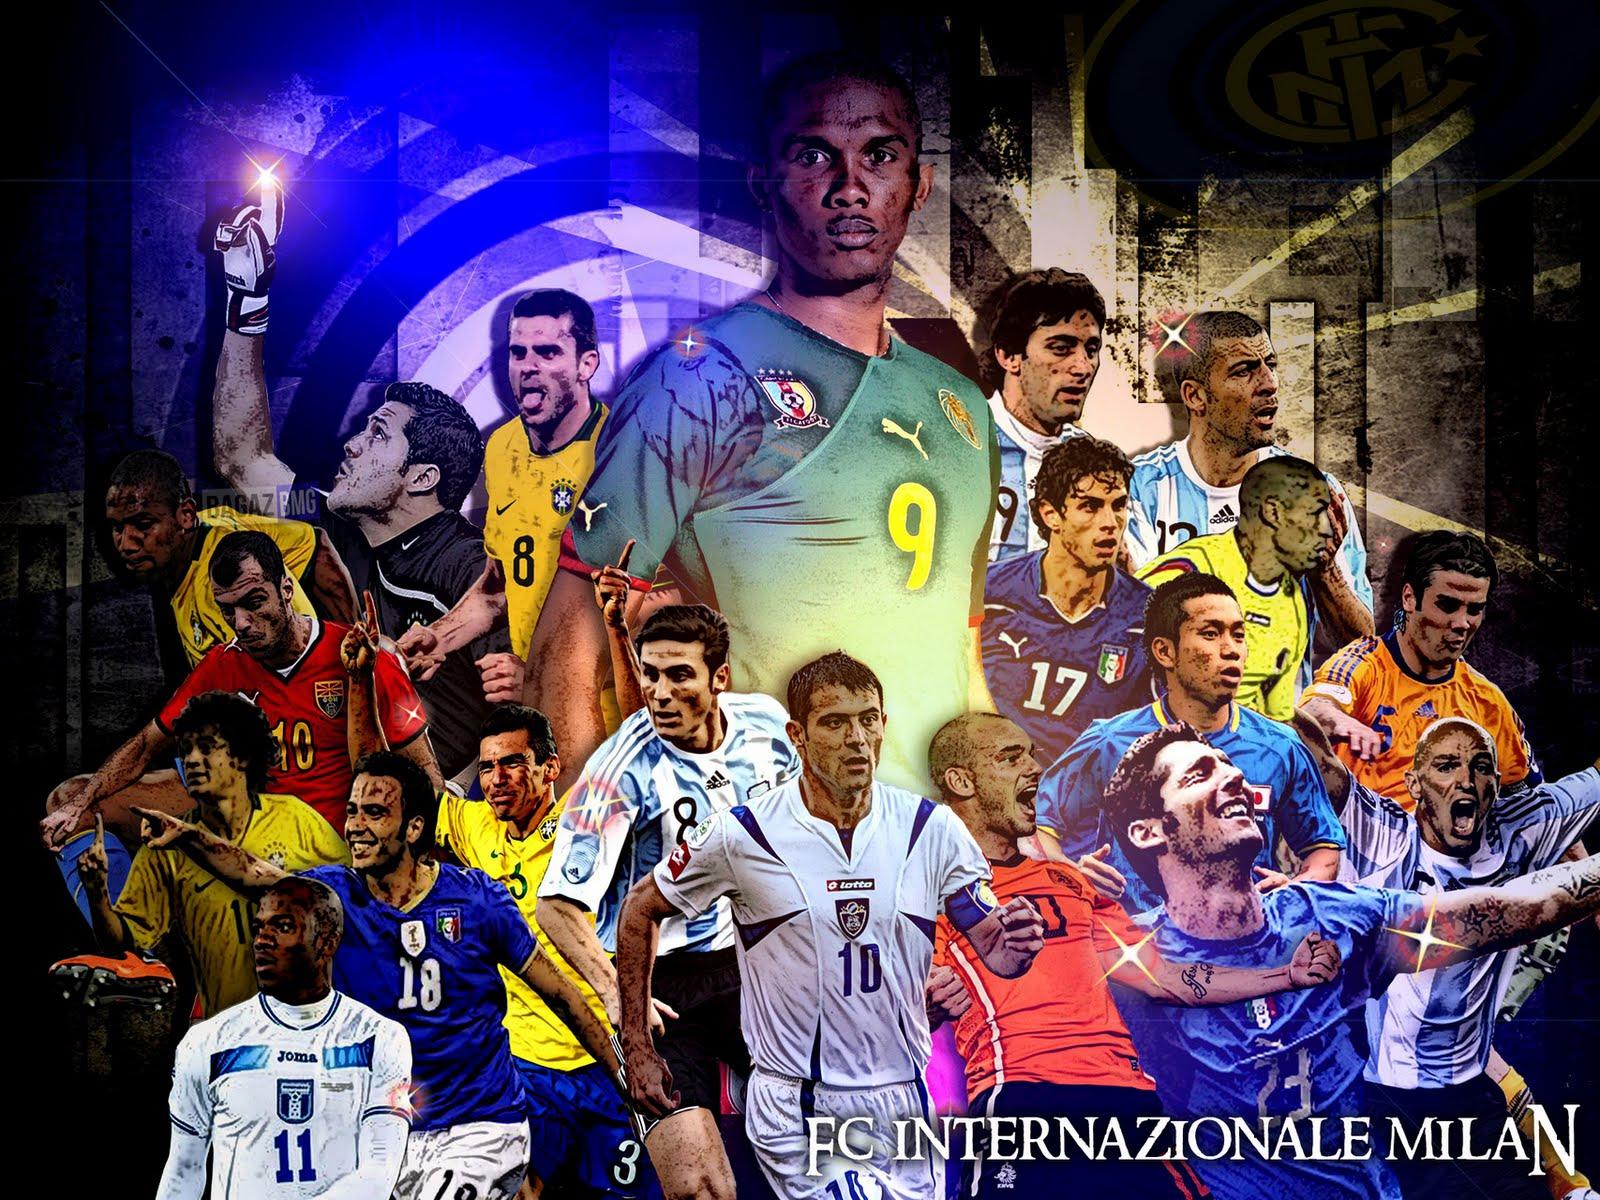 Wallpaper Uefa Champions League 2011 Wallpapers   Football Champions 1600x1200